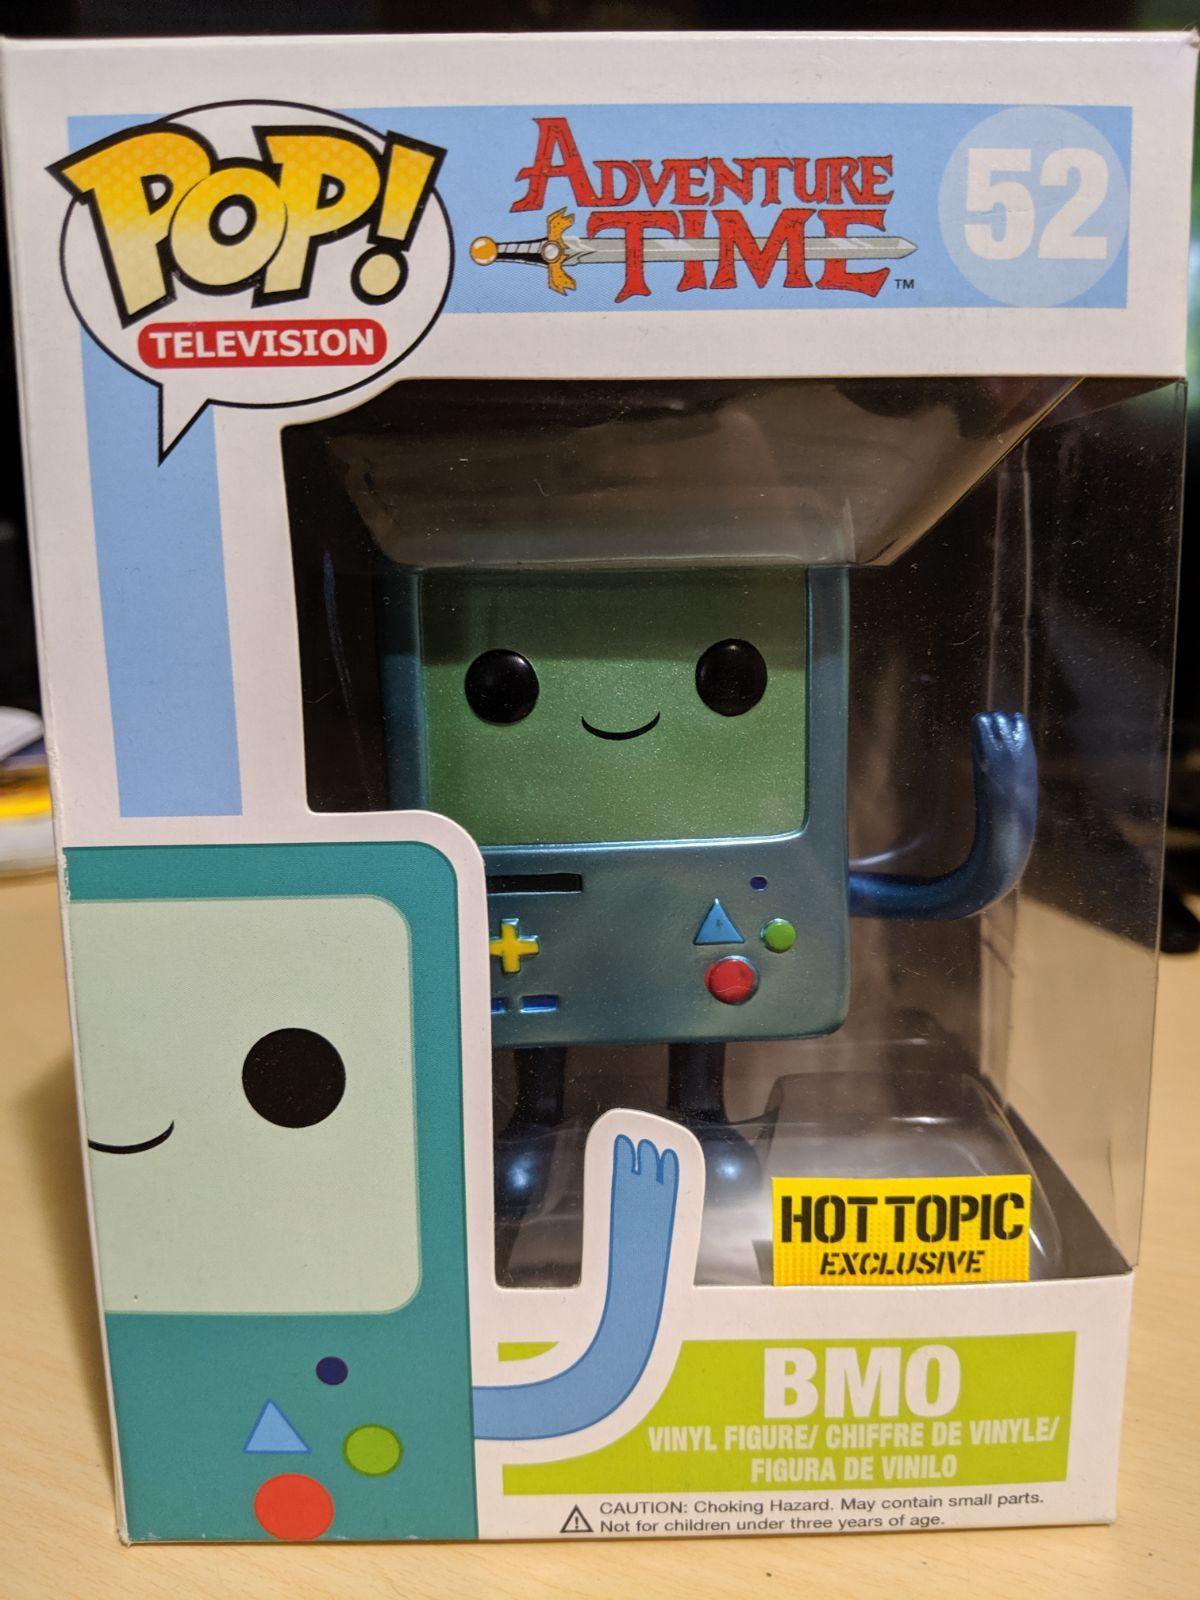 Limited Edition Shiny Bmo Funko Pop Box Has Never Been Opened Funko Pop Funko Bmo